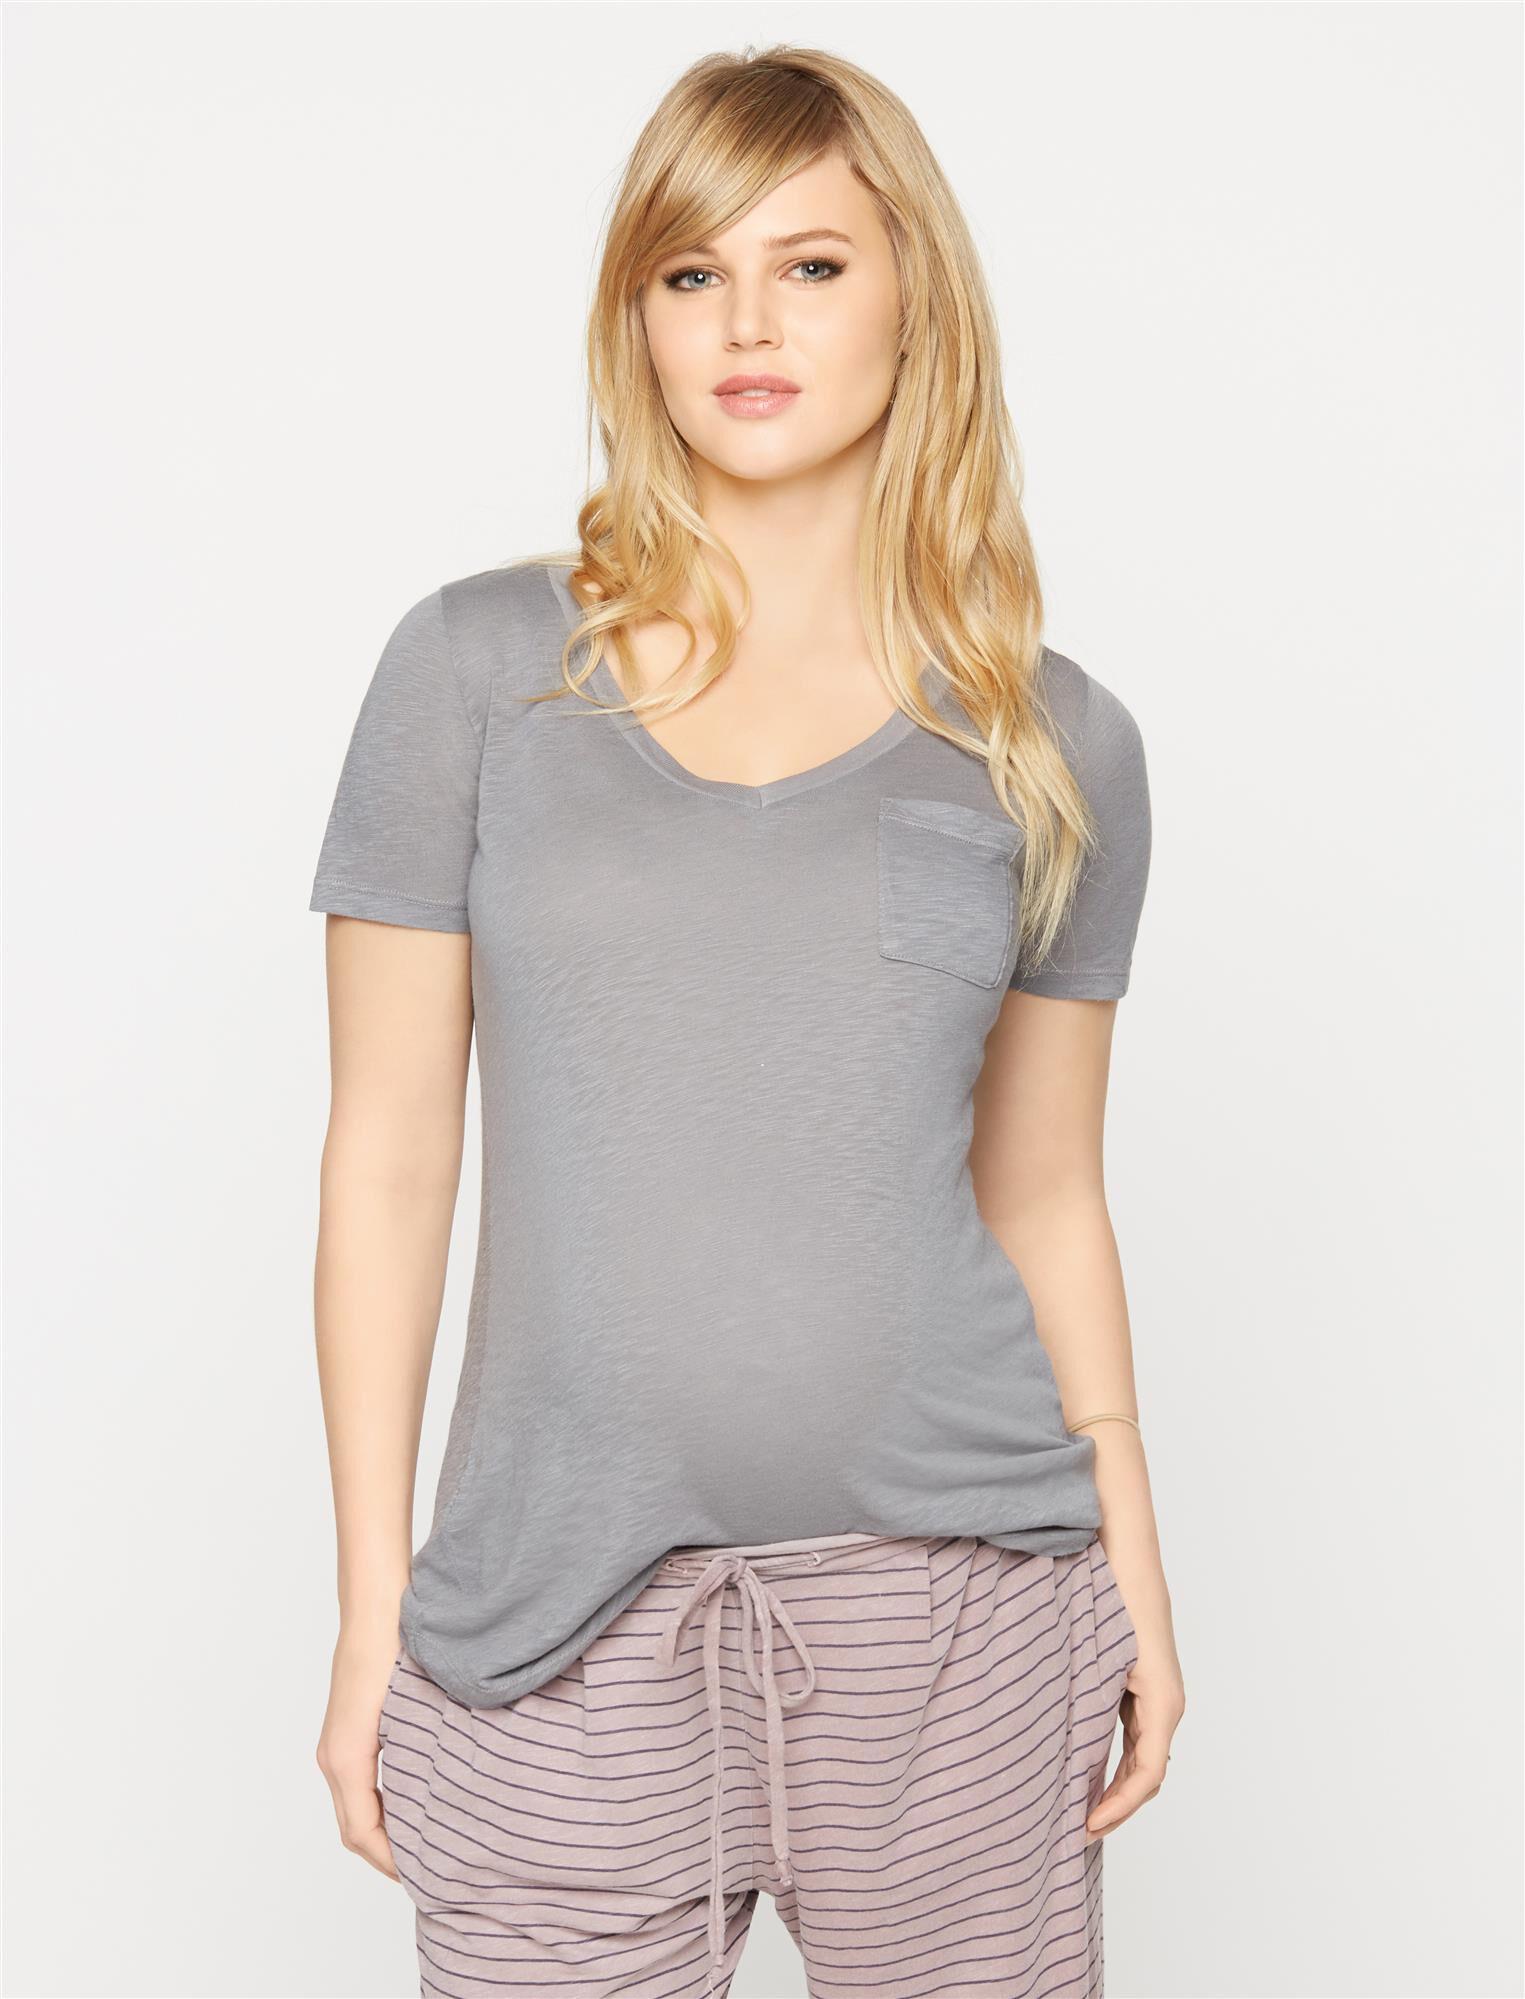 Splendid Super Soft Maternity T Shirt